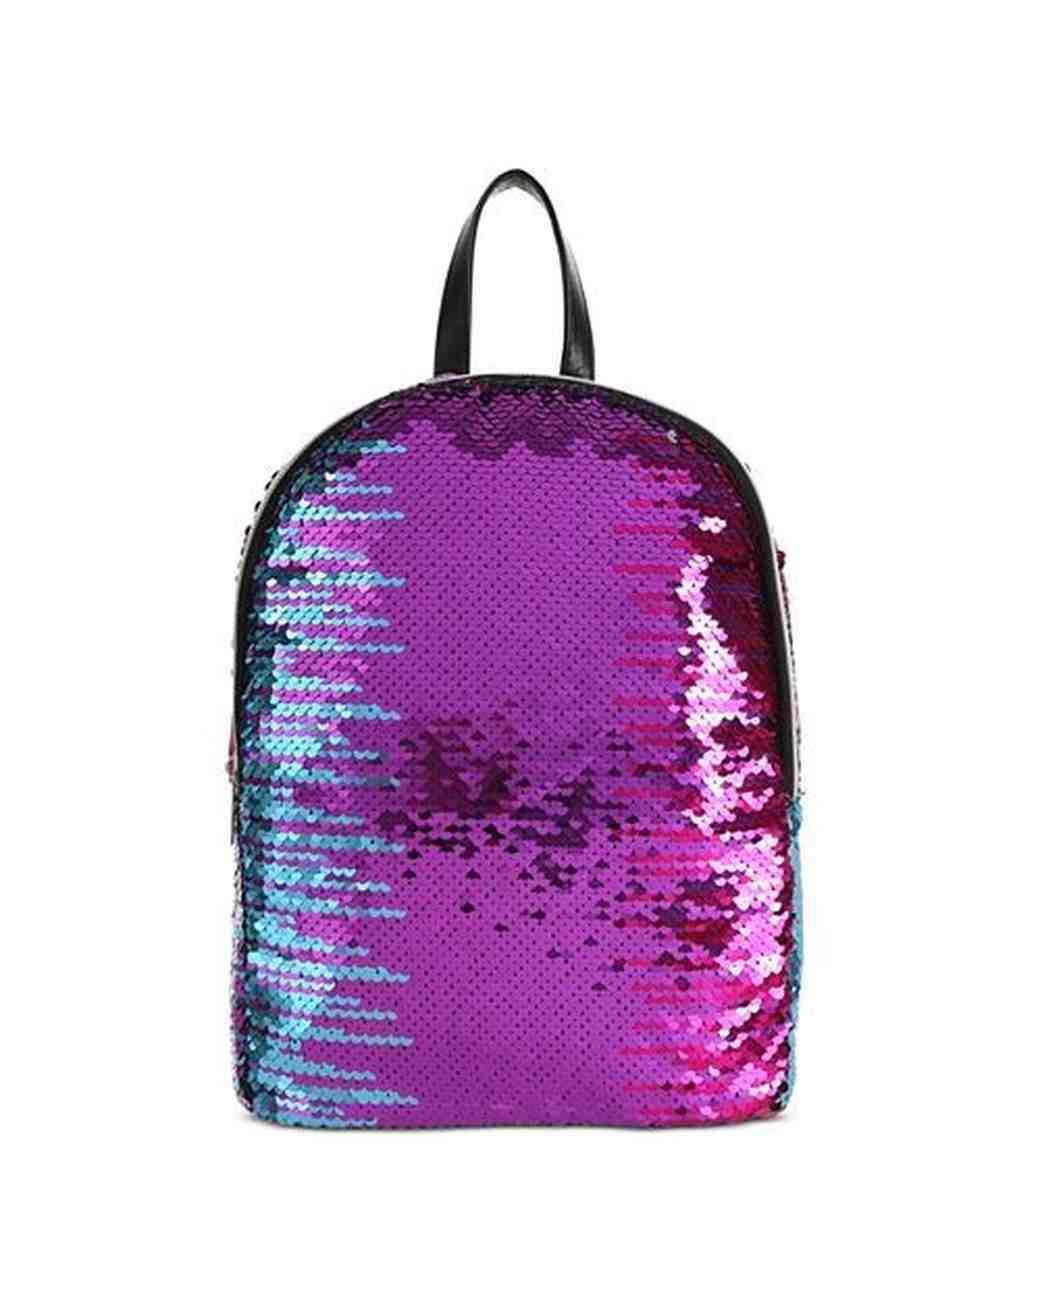 flower girl gift guide capelli mini purple sequin backpack